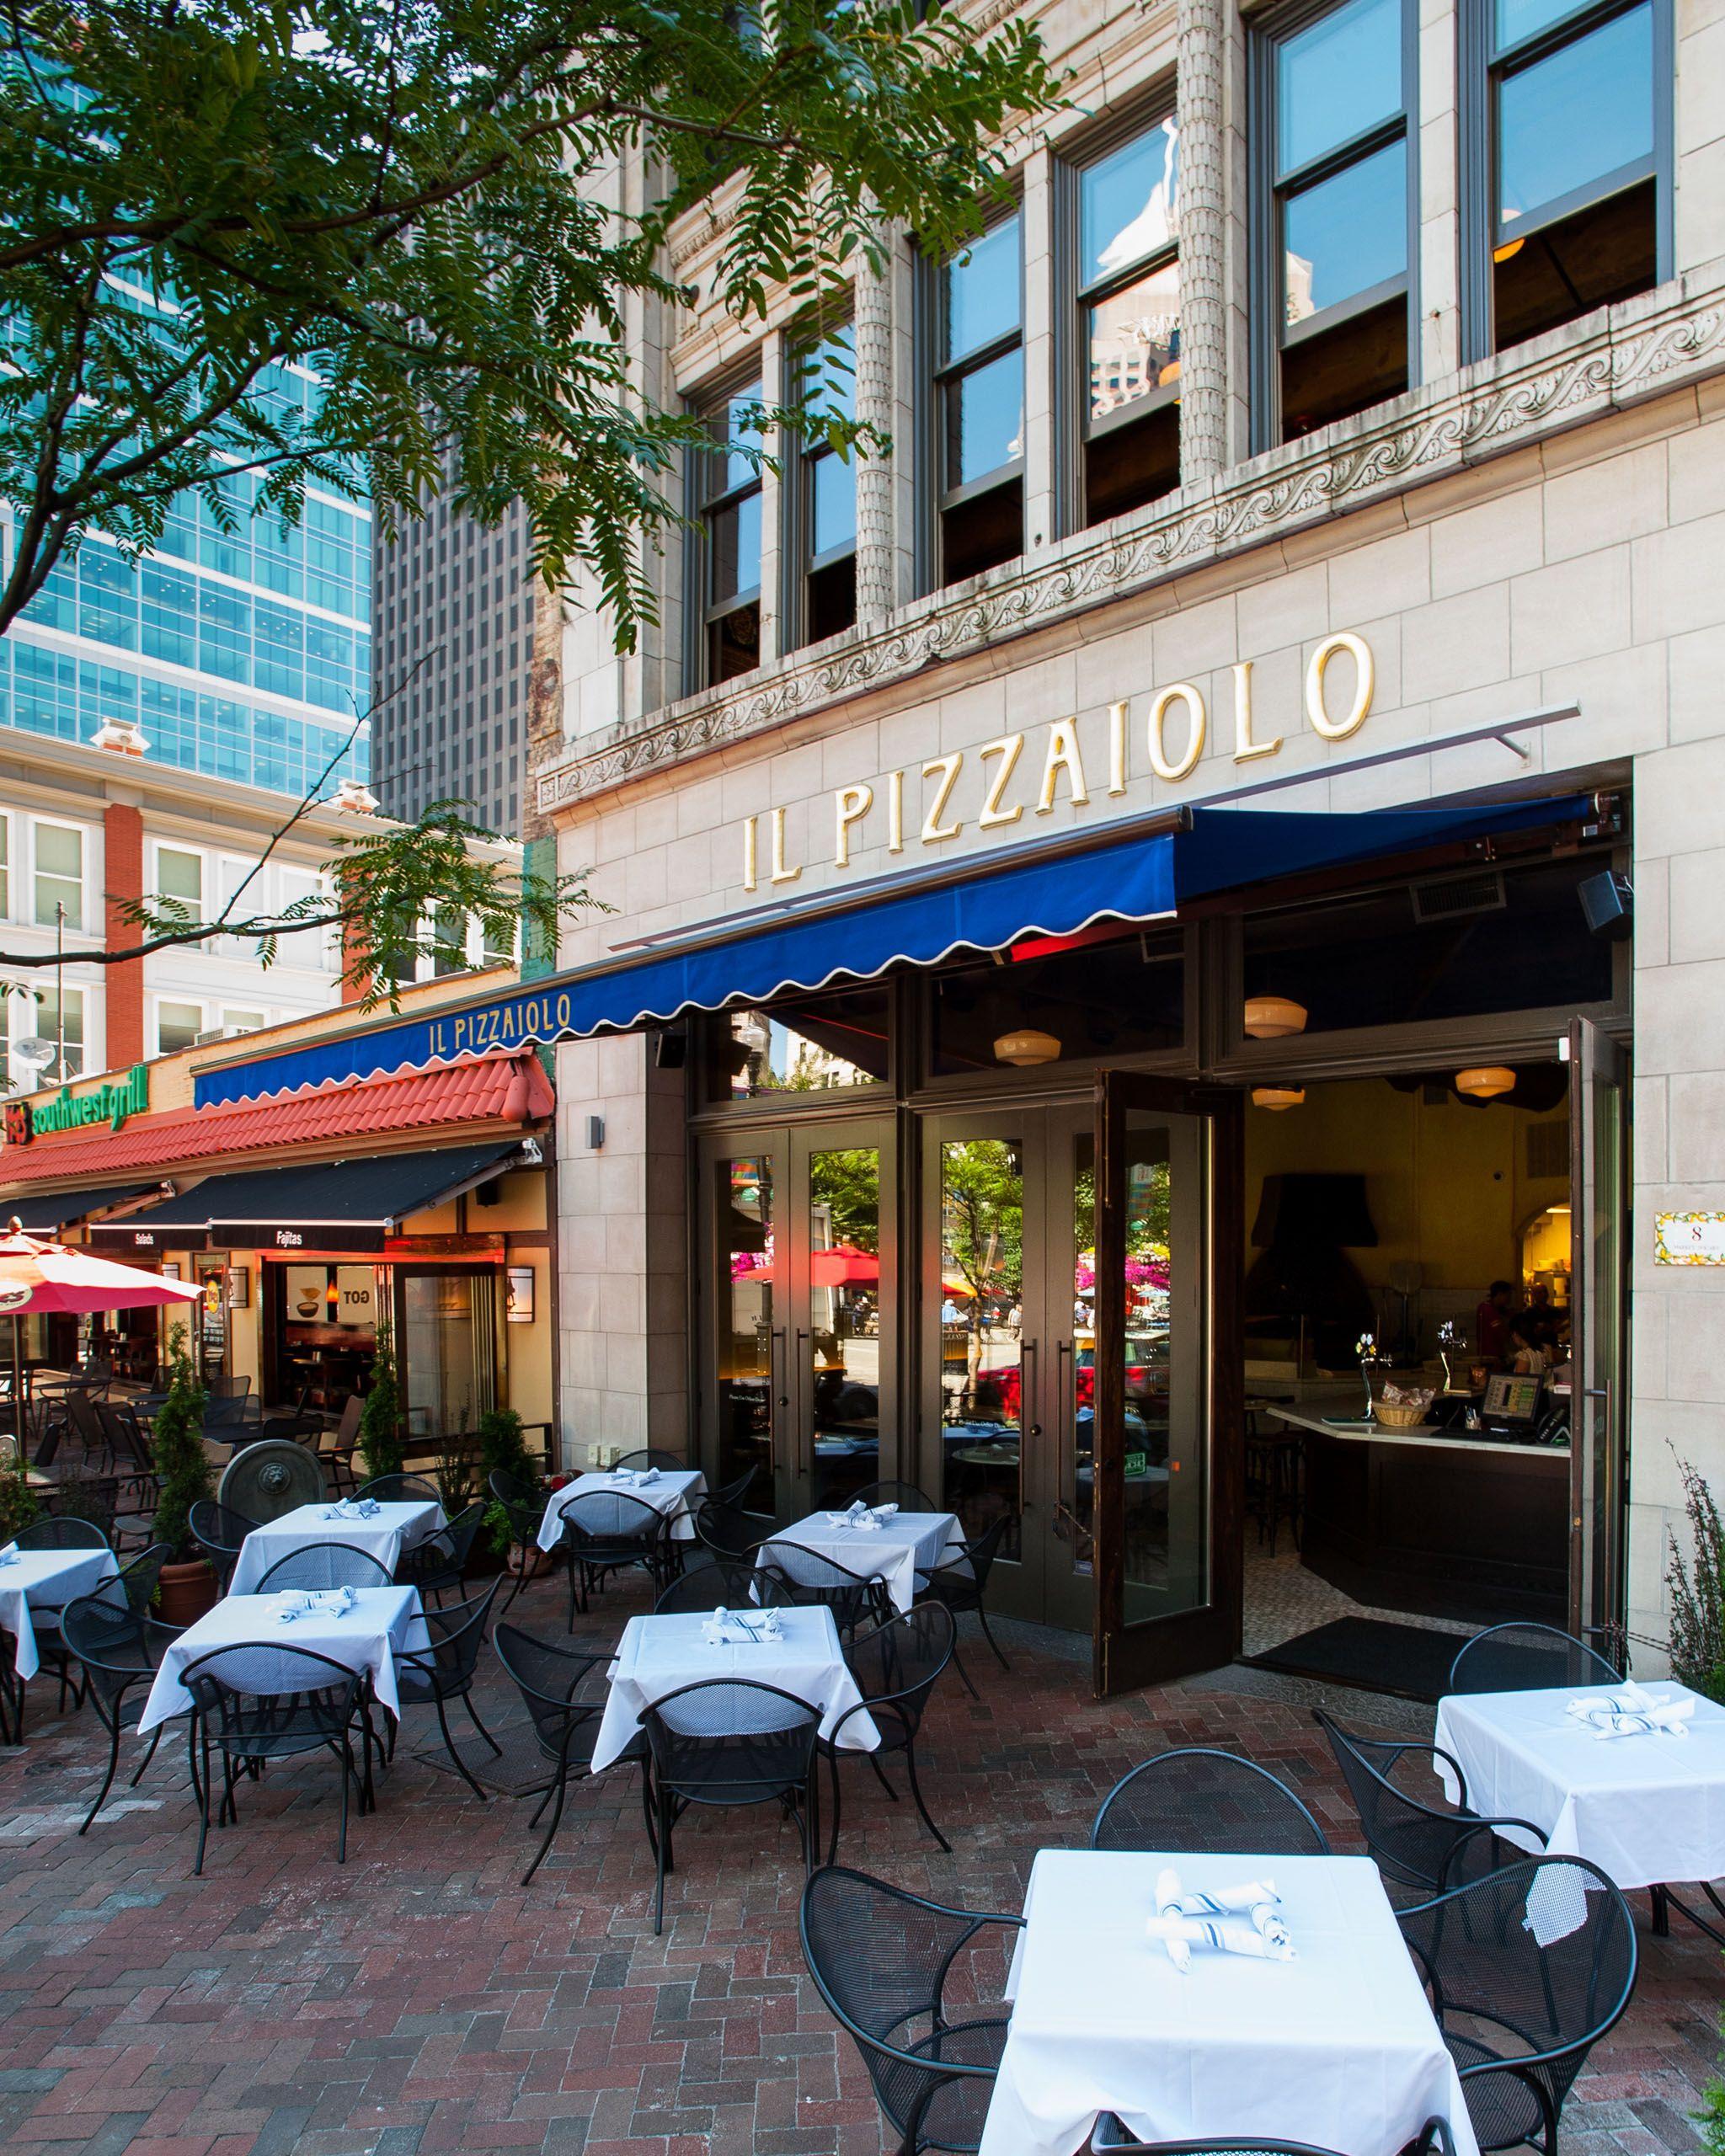 Restaurant Il Pizzaiolo Located In Downtown Pittsburgh Market Square Restaurantdesign